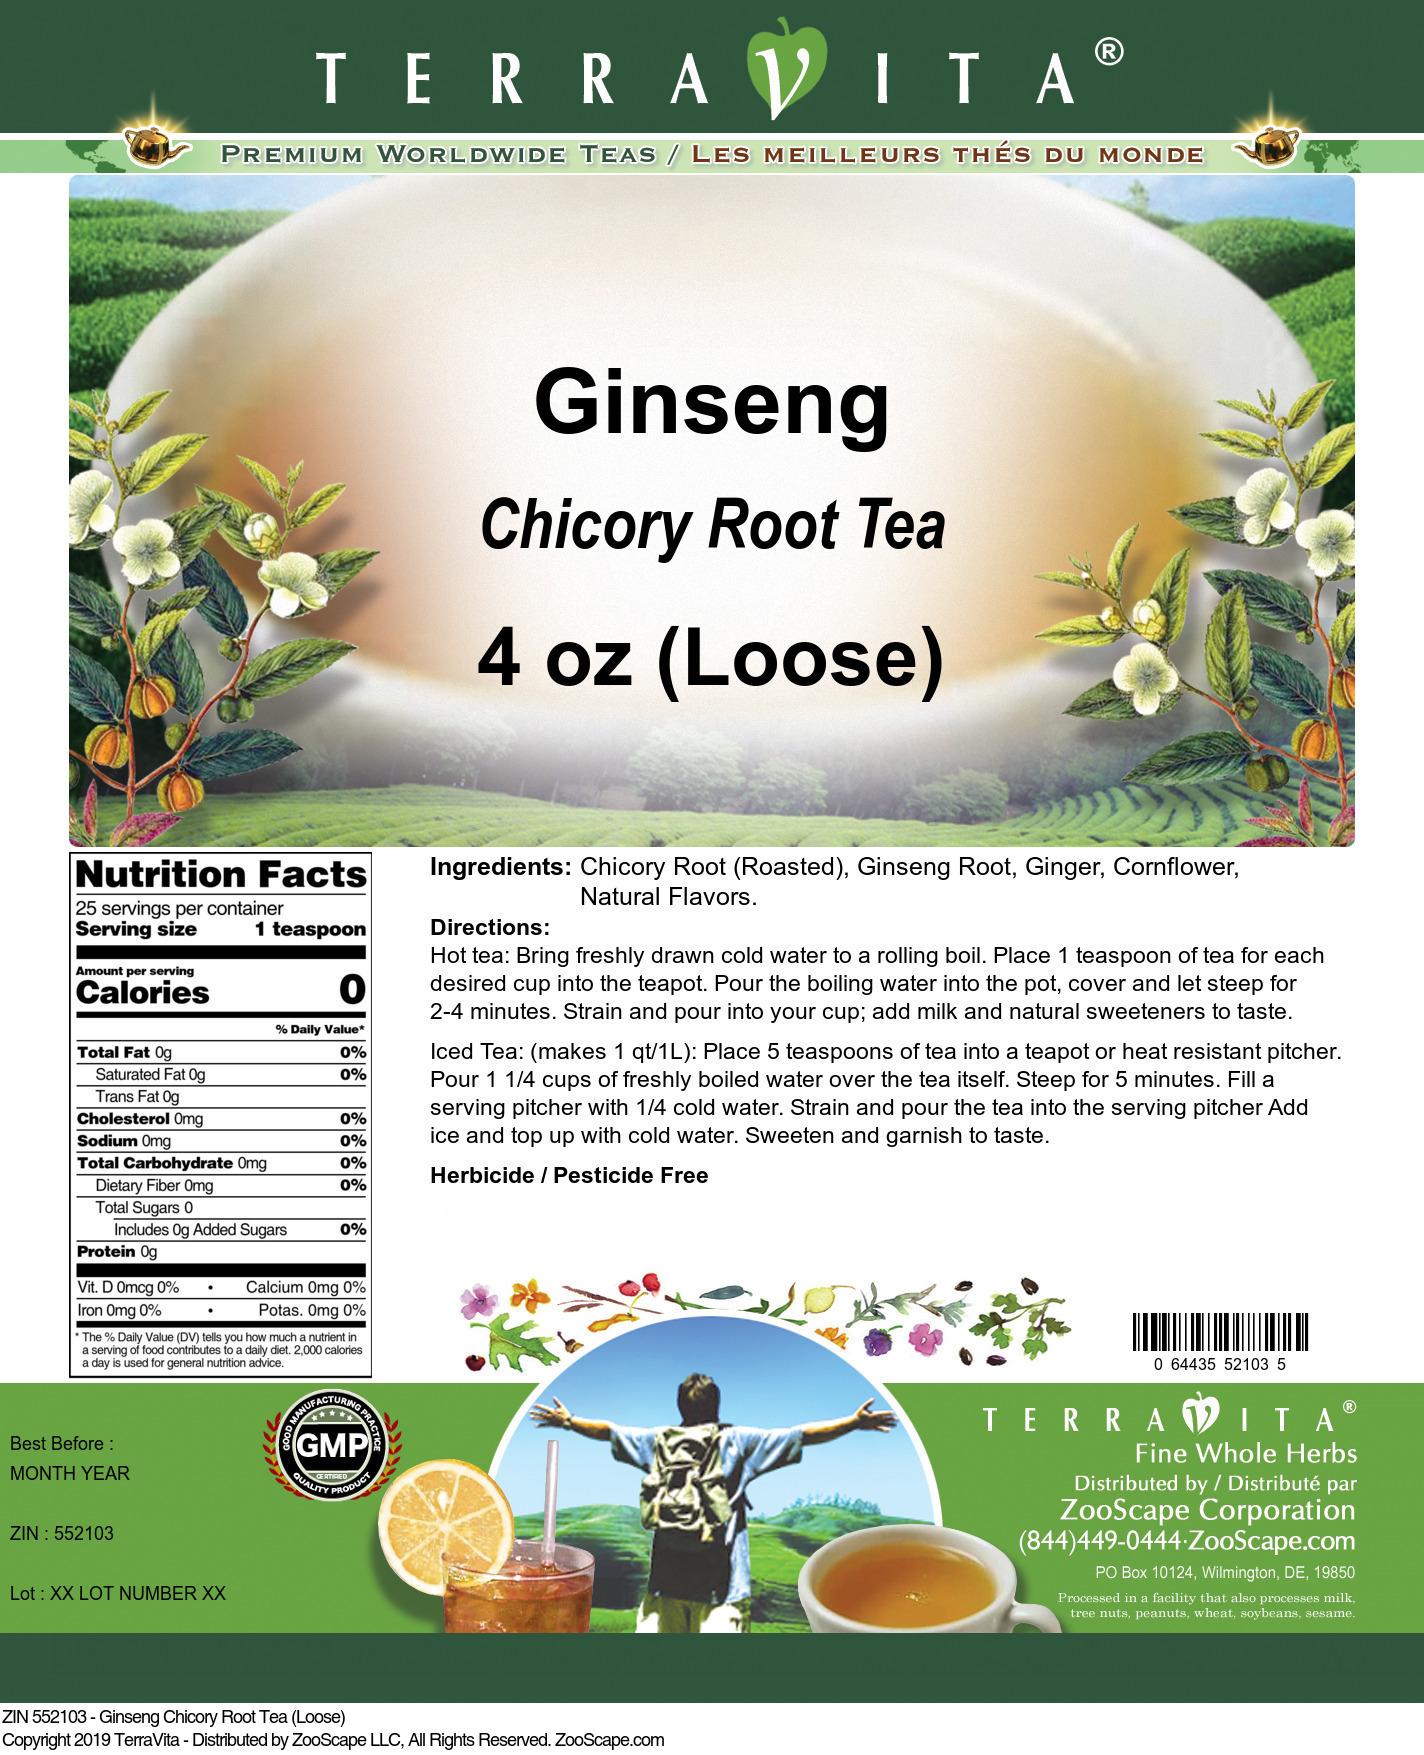 Ginseng Chicory Root